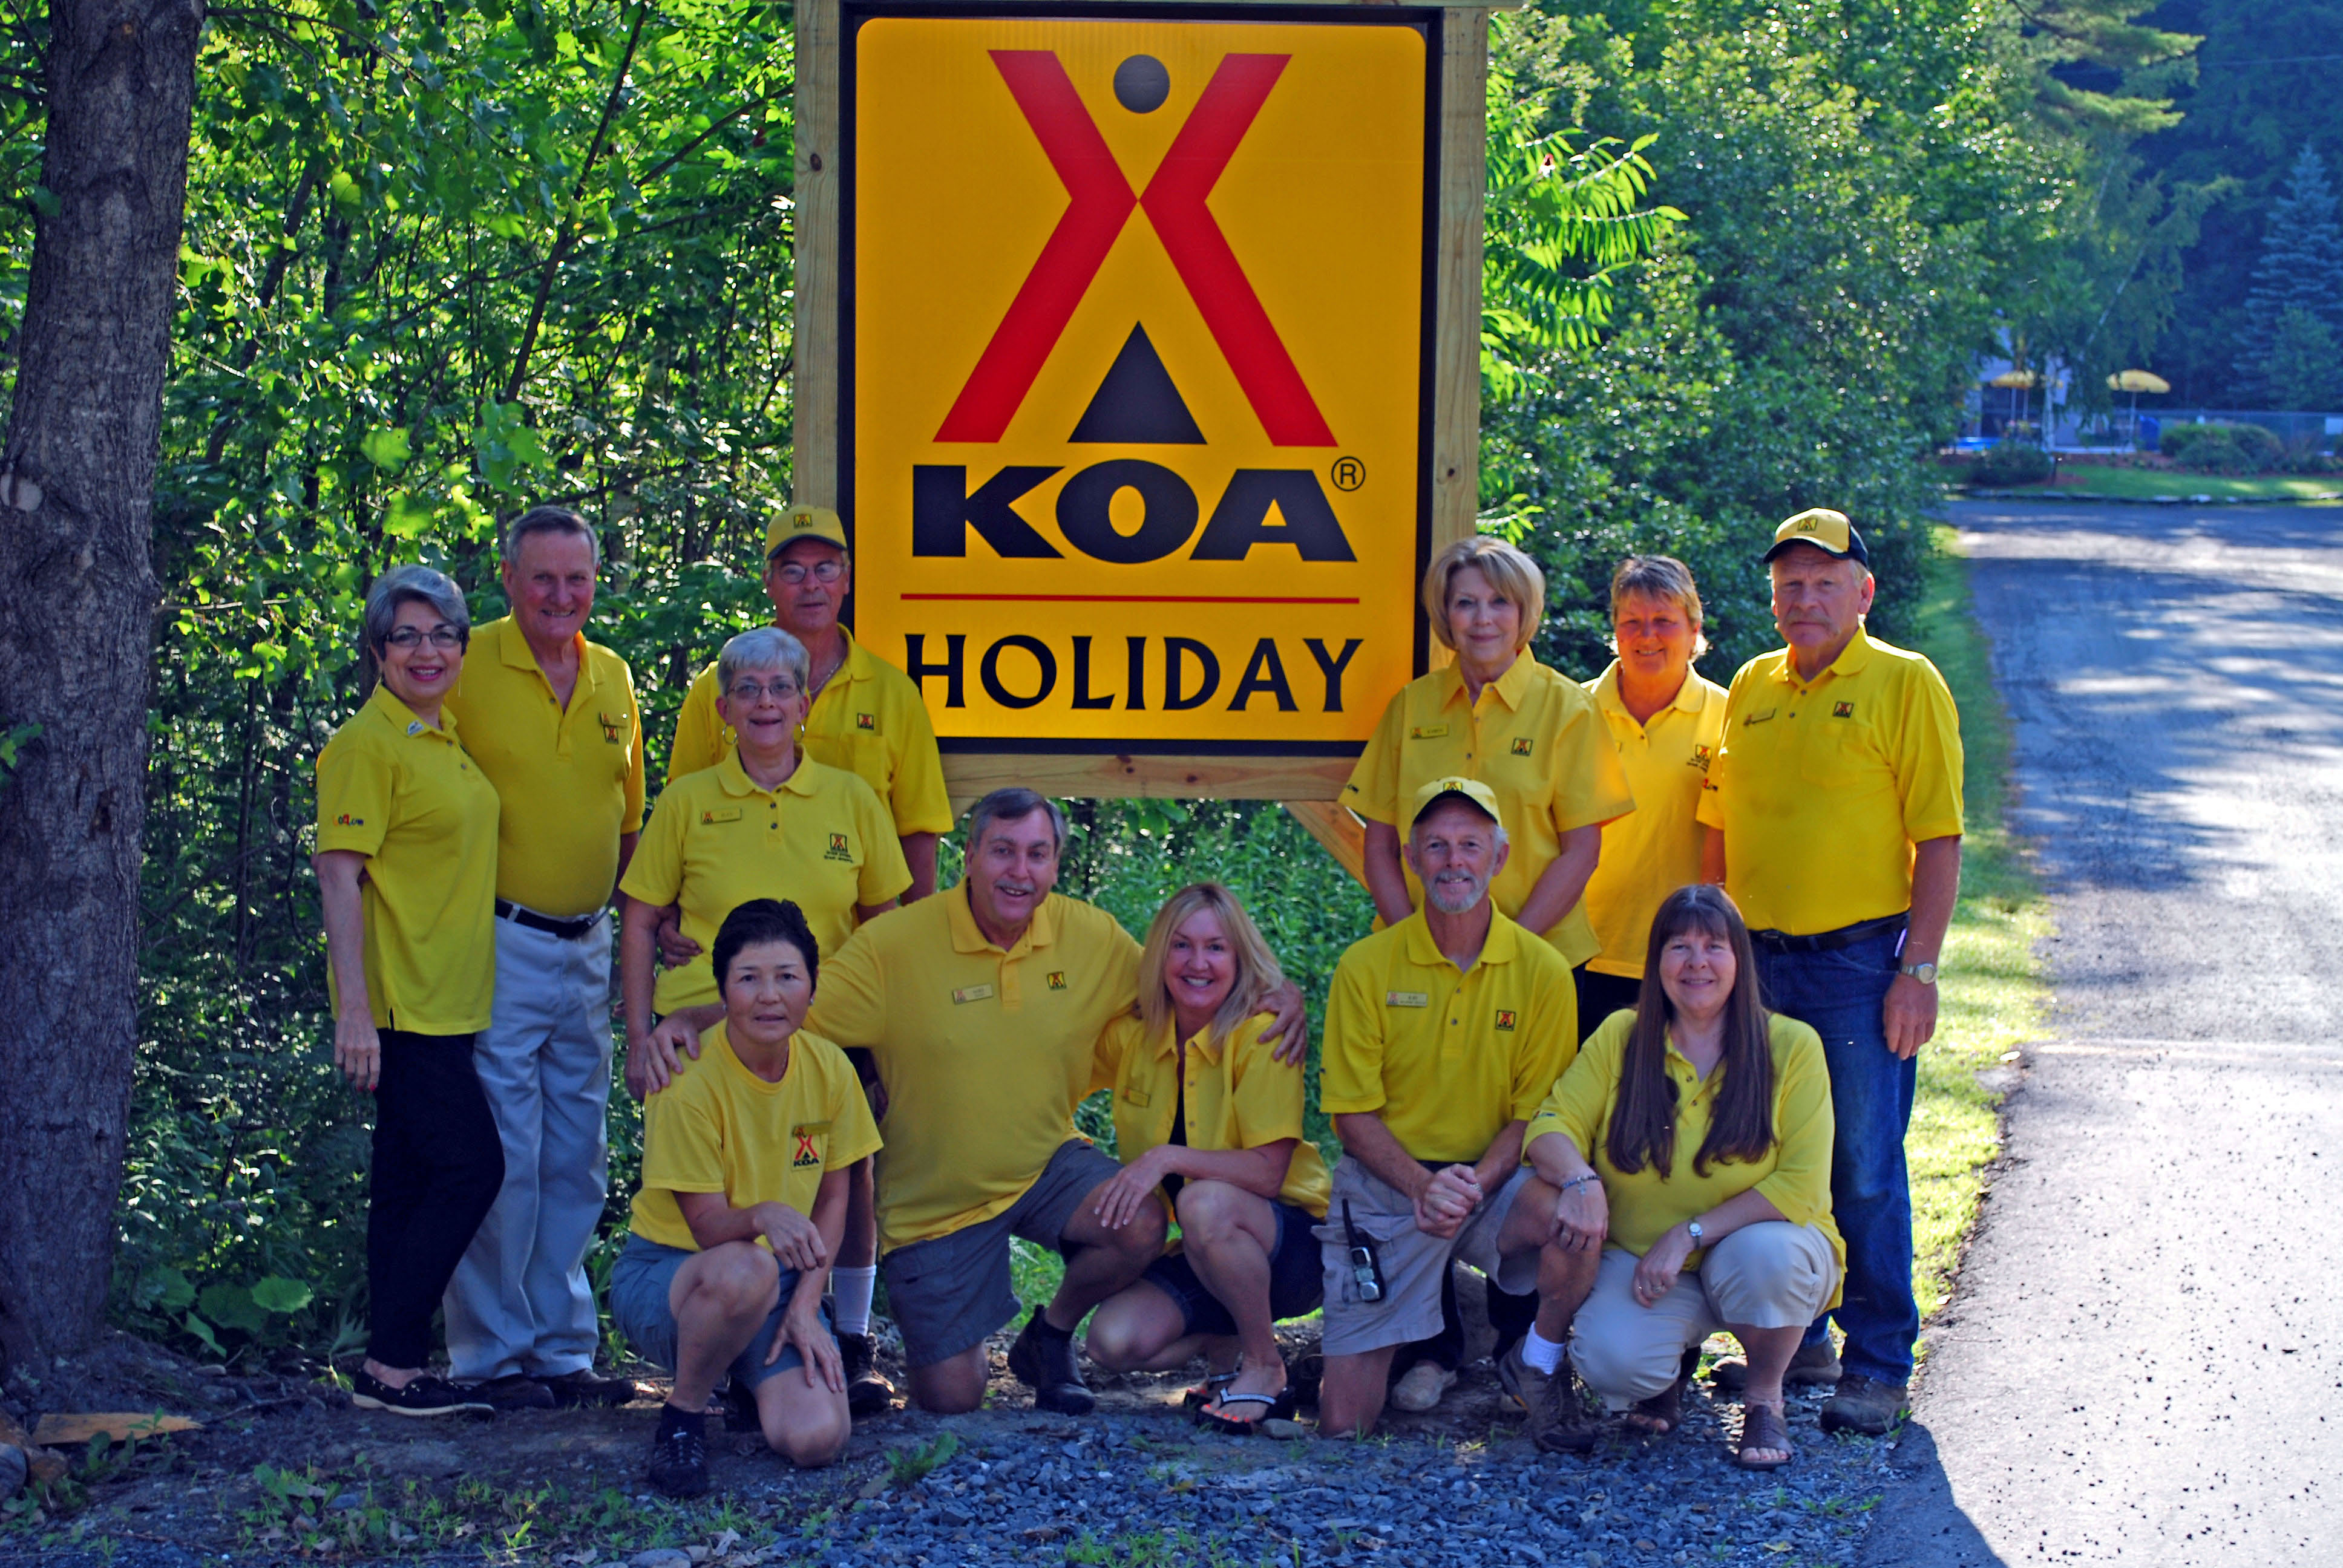 Quechee / Pine Valley KOA Holiday image 7